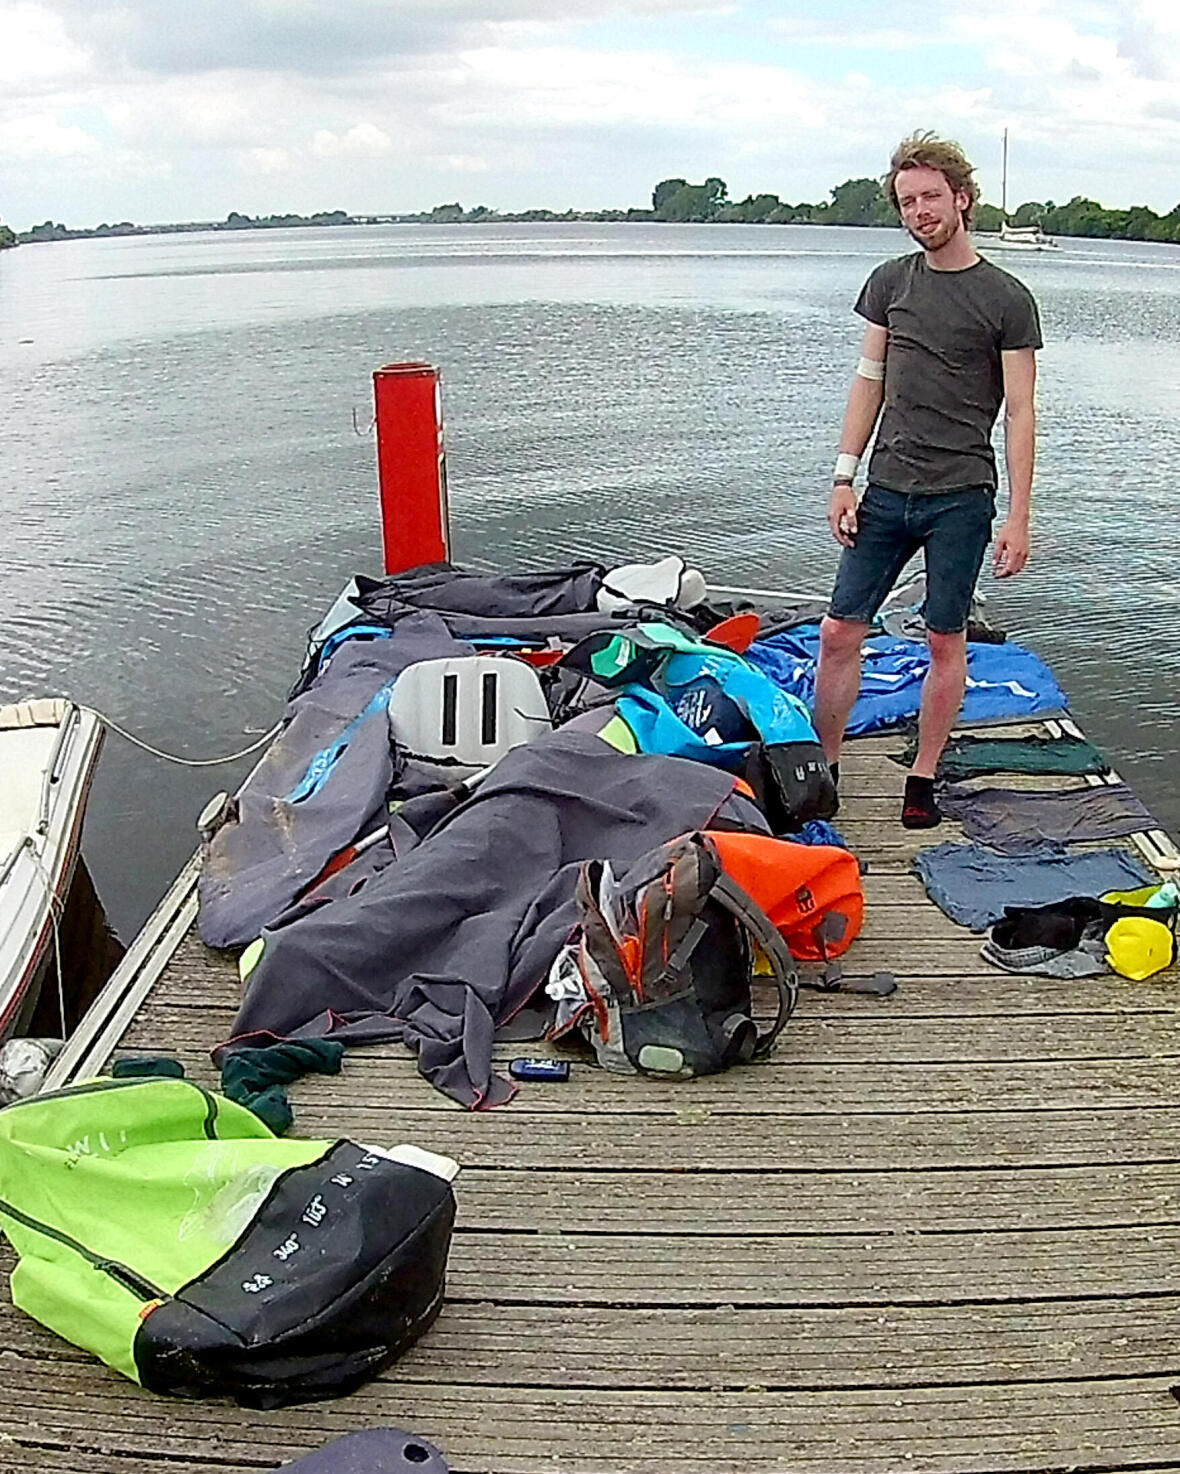 inflatable kayak trip itiwit tagus river